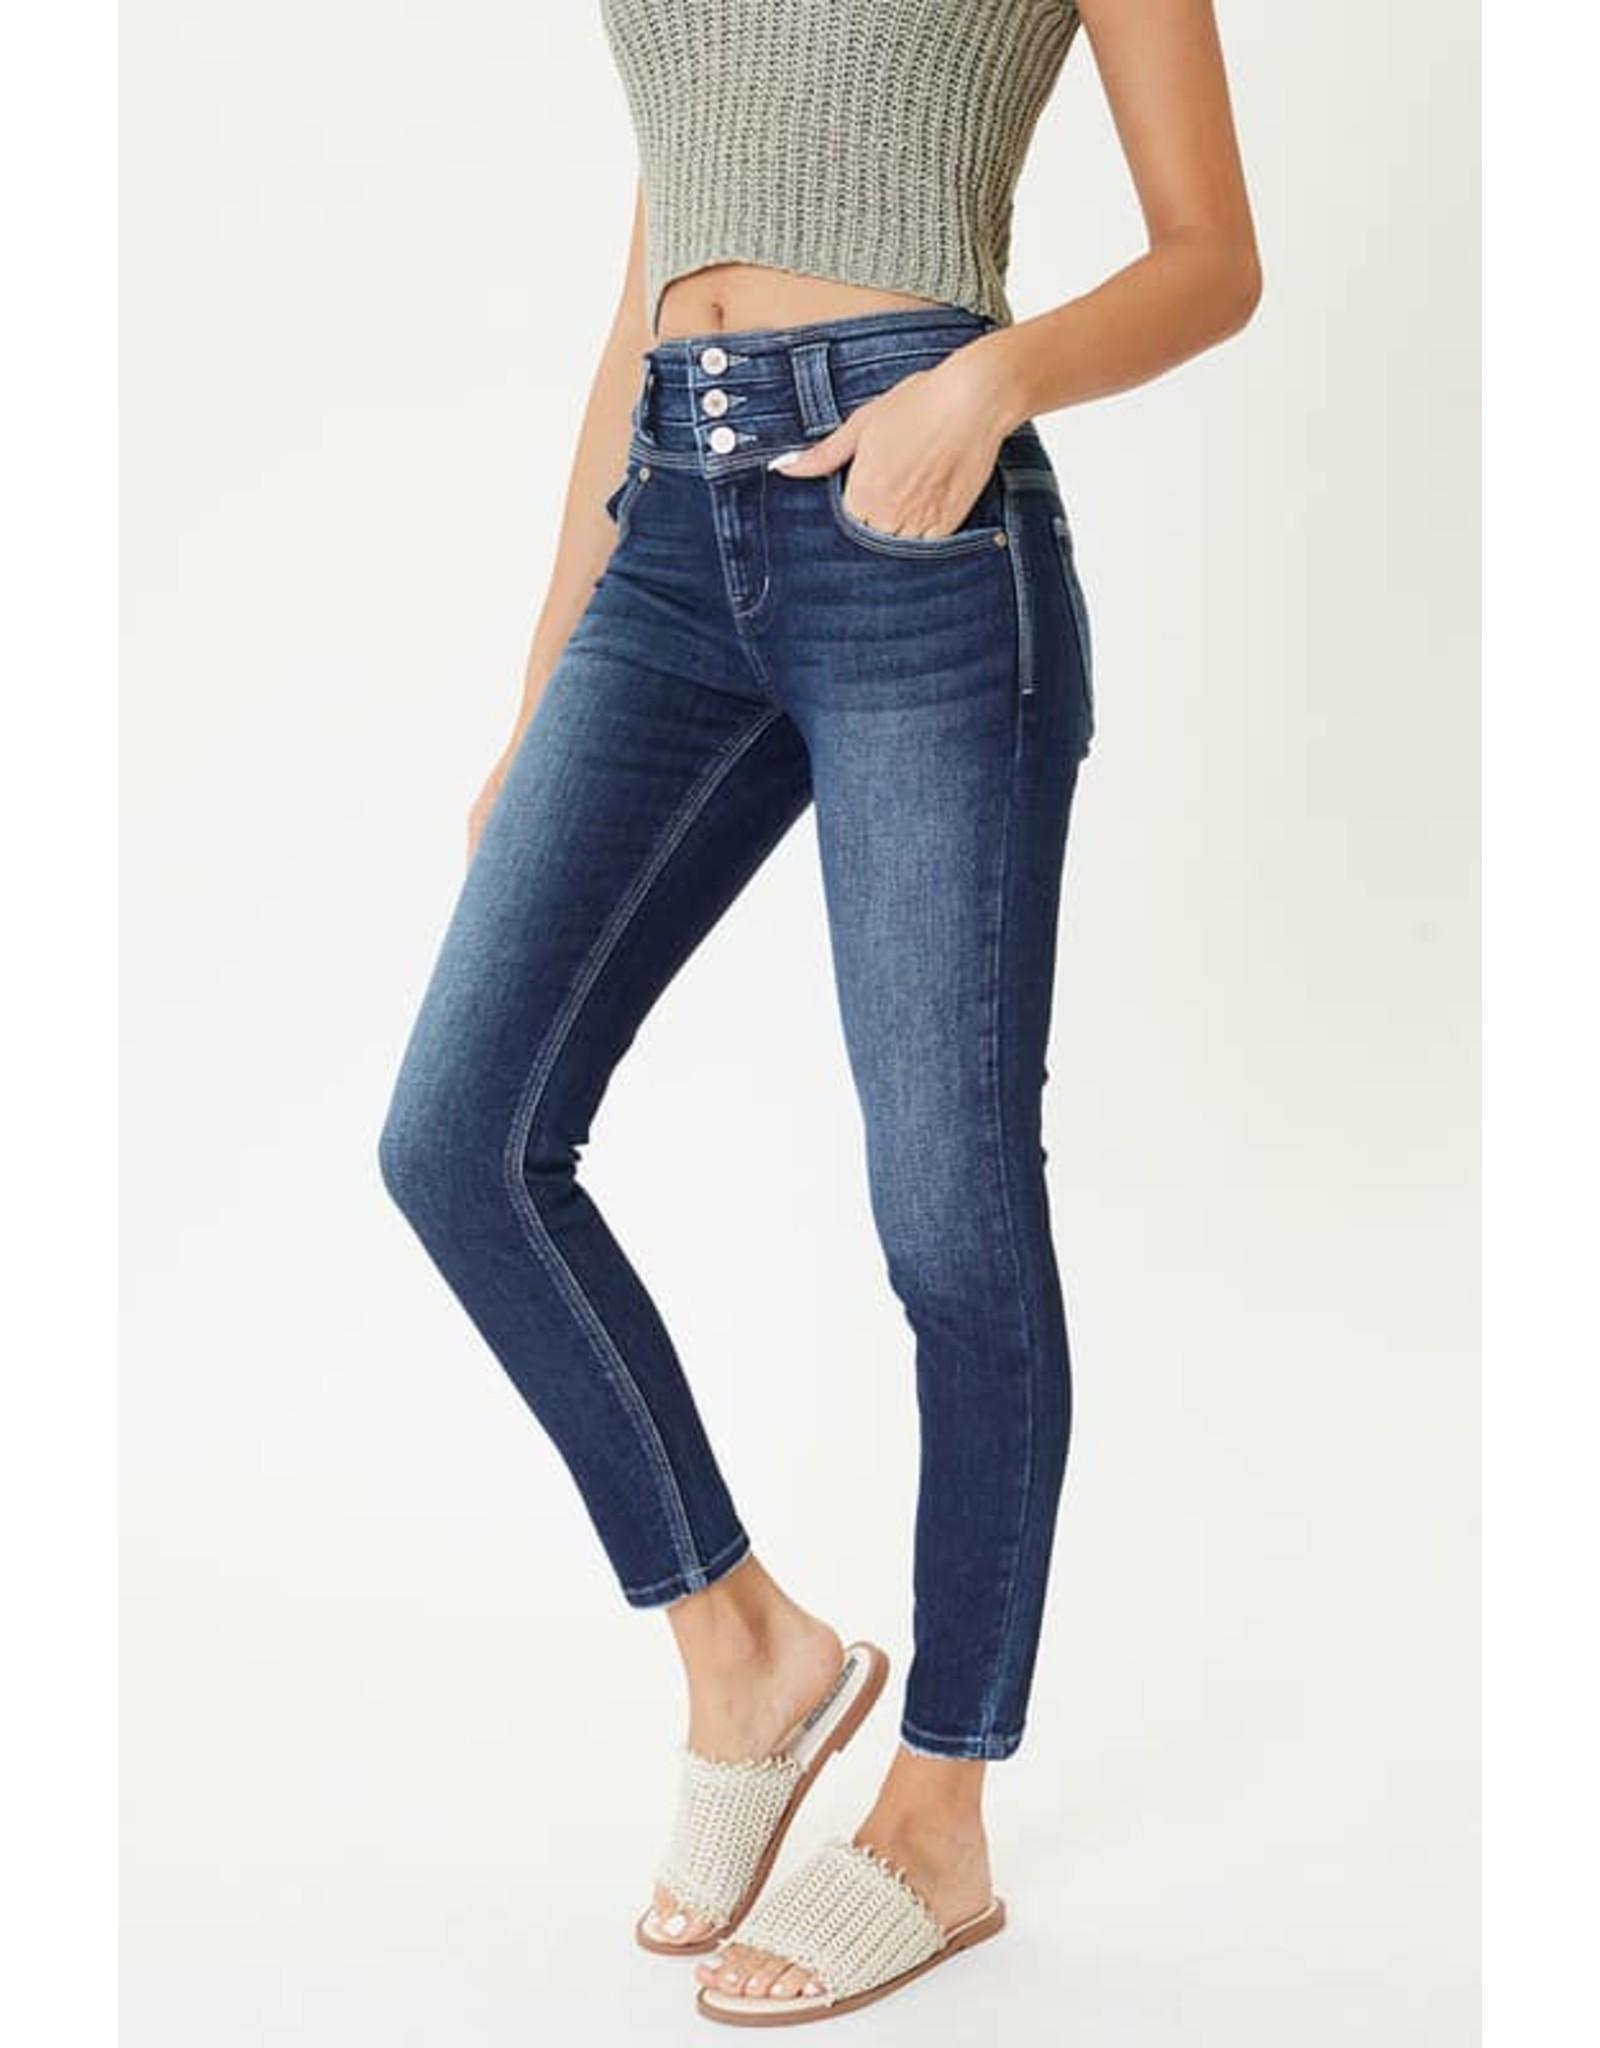 Alexandria KanCan Jeans